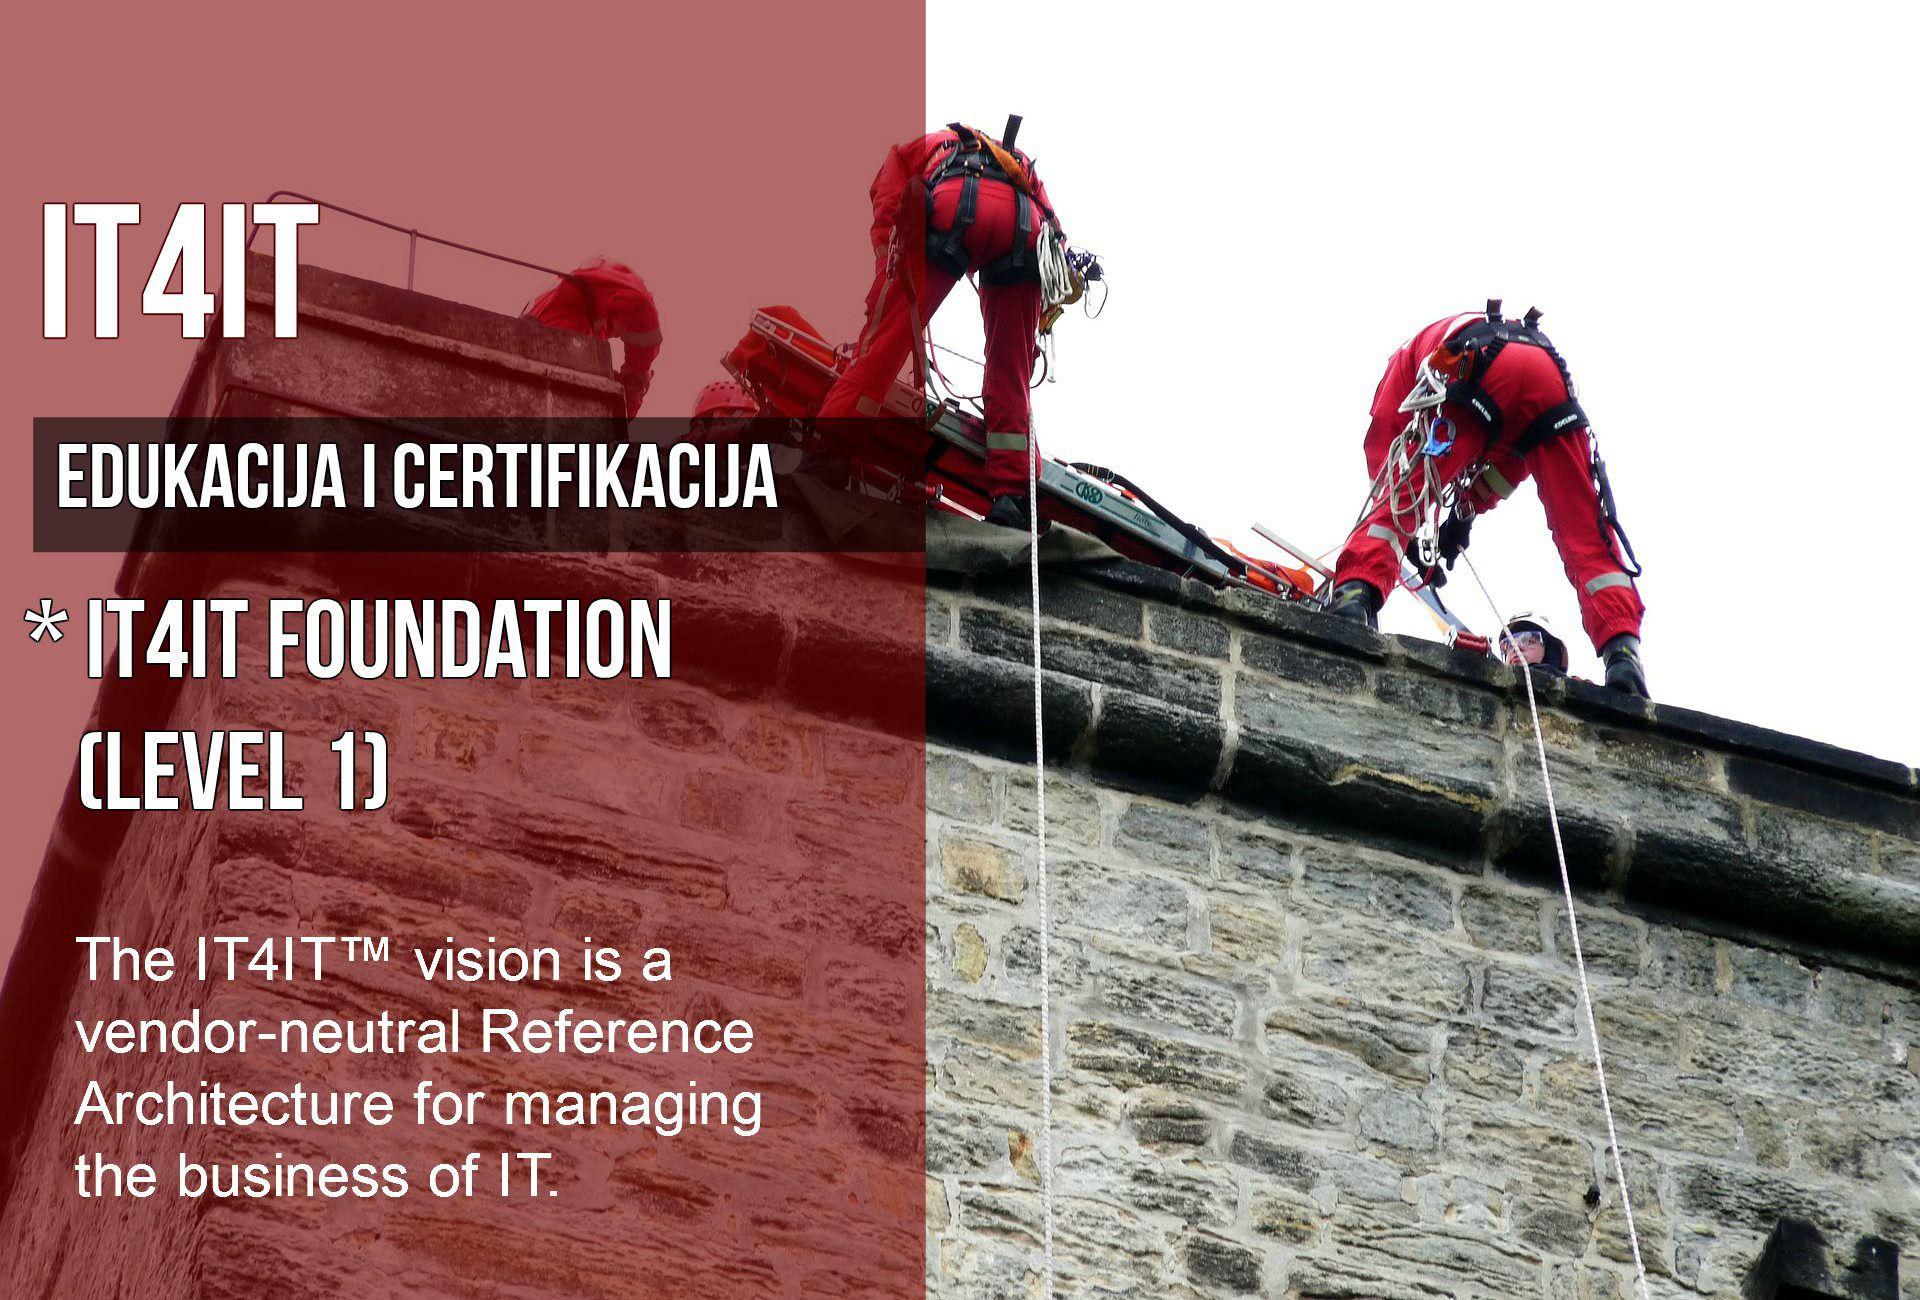 ITS Partner - Edukacija - IT4IT Edukacija i certifikacija